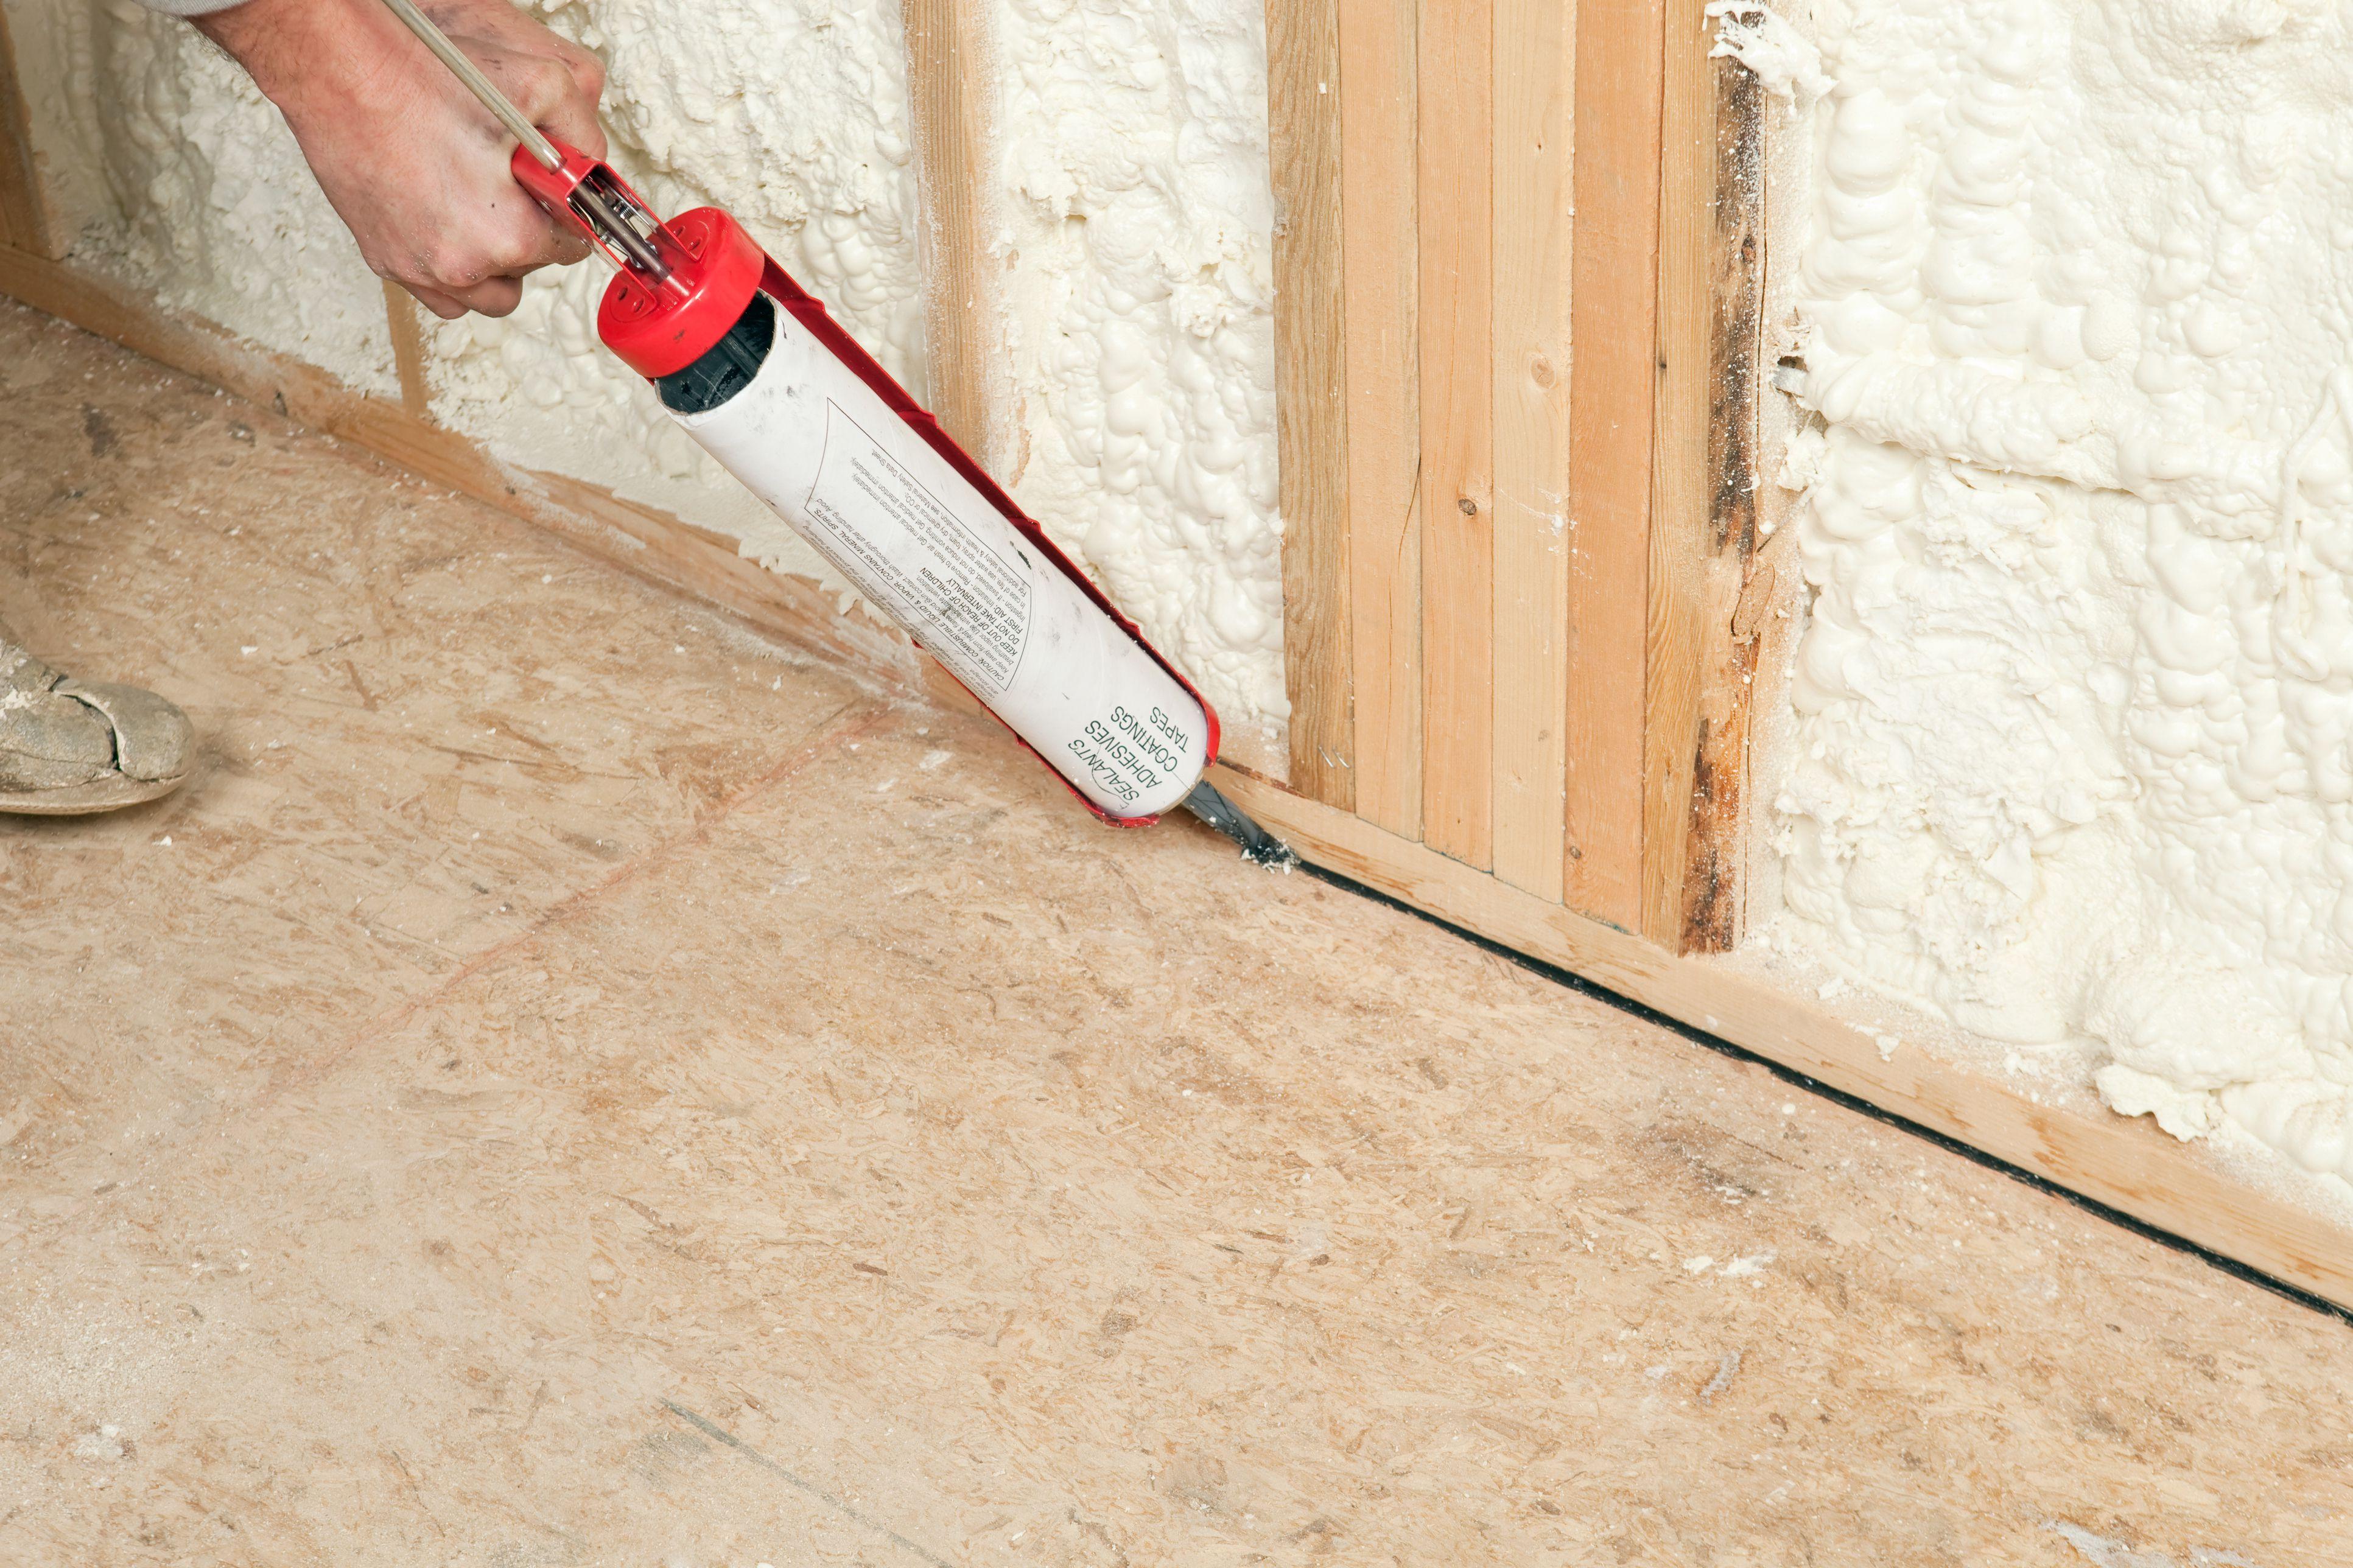 texas hardwood flooring reviews of osb oriented strand board sub flooring inside worker caulking wall plate to subfloor 185099682 57fa64803df78c690f7666e2